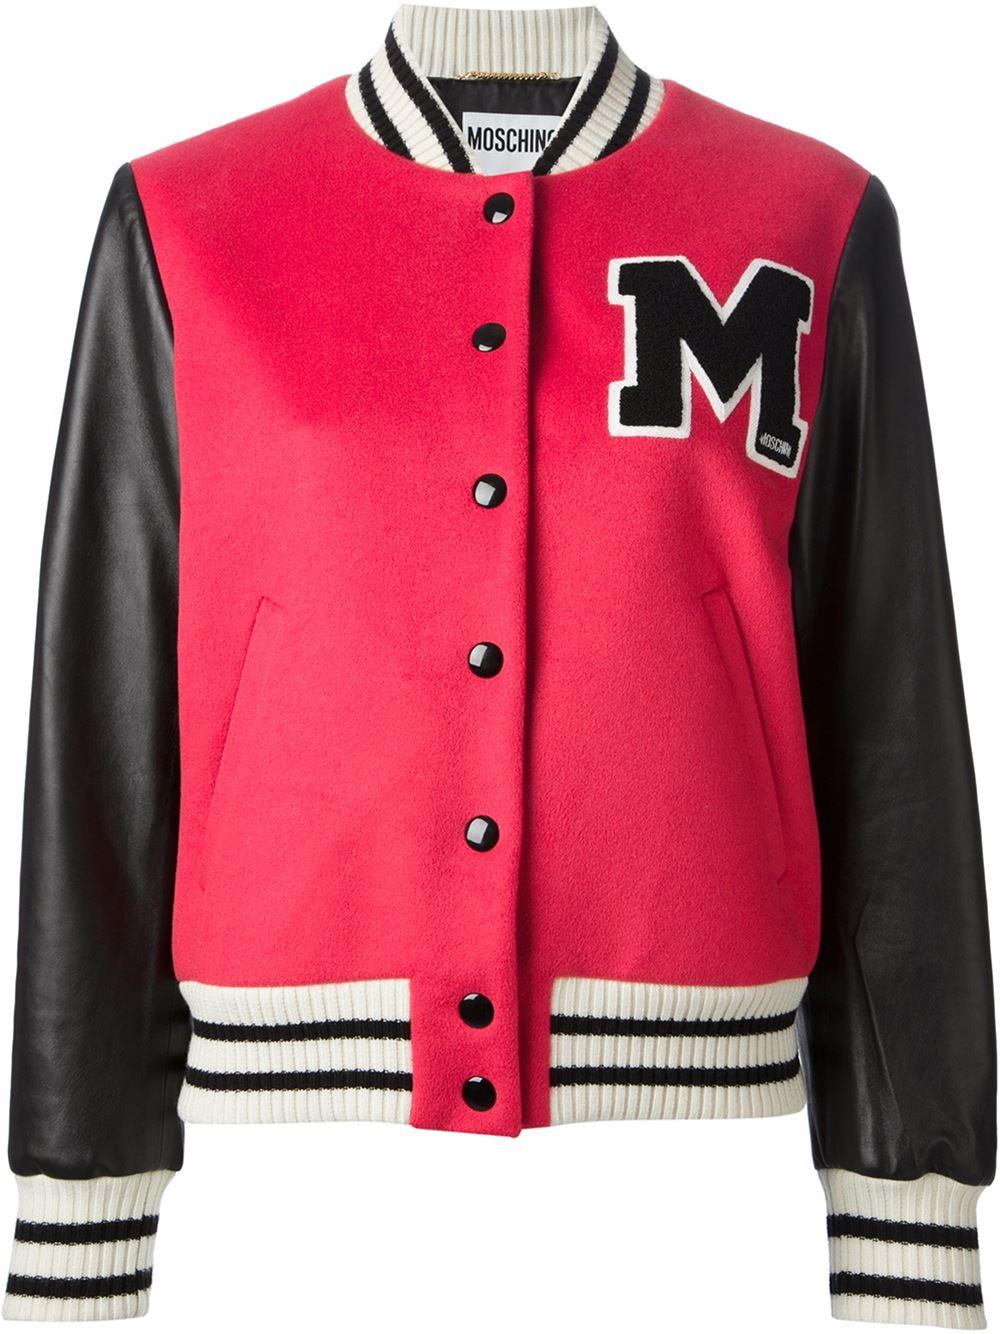 Moschino red black white virgin wool sheepskin varsity bomber jacket